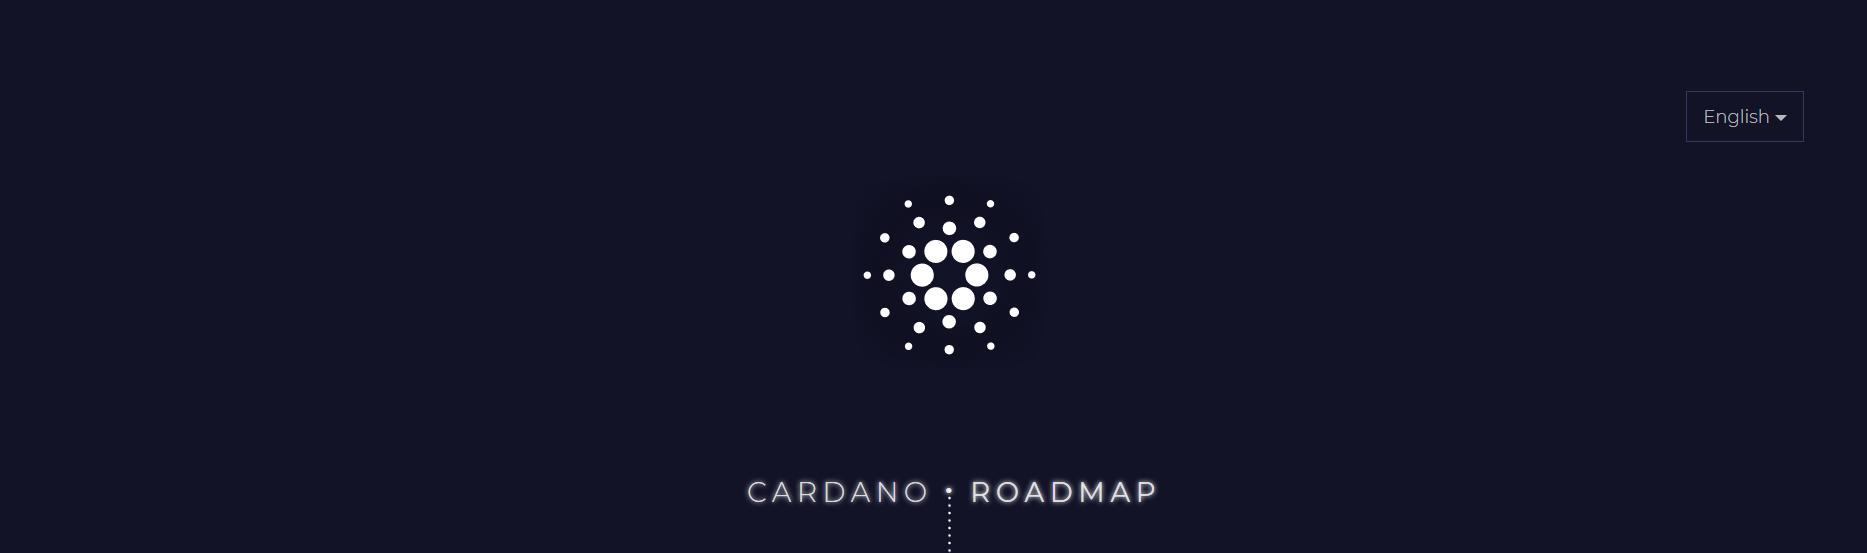 Cardano Roadmap